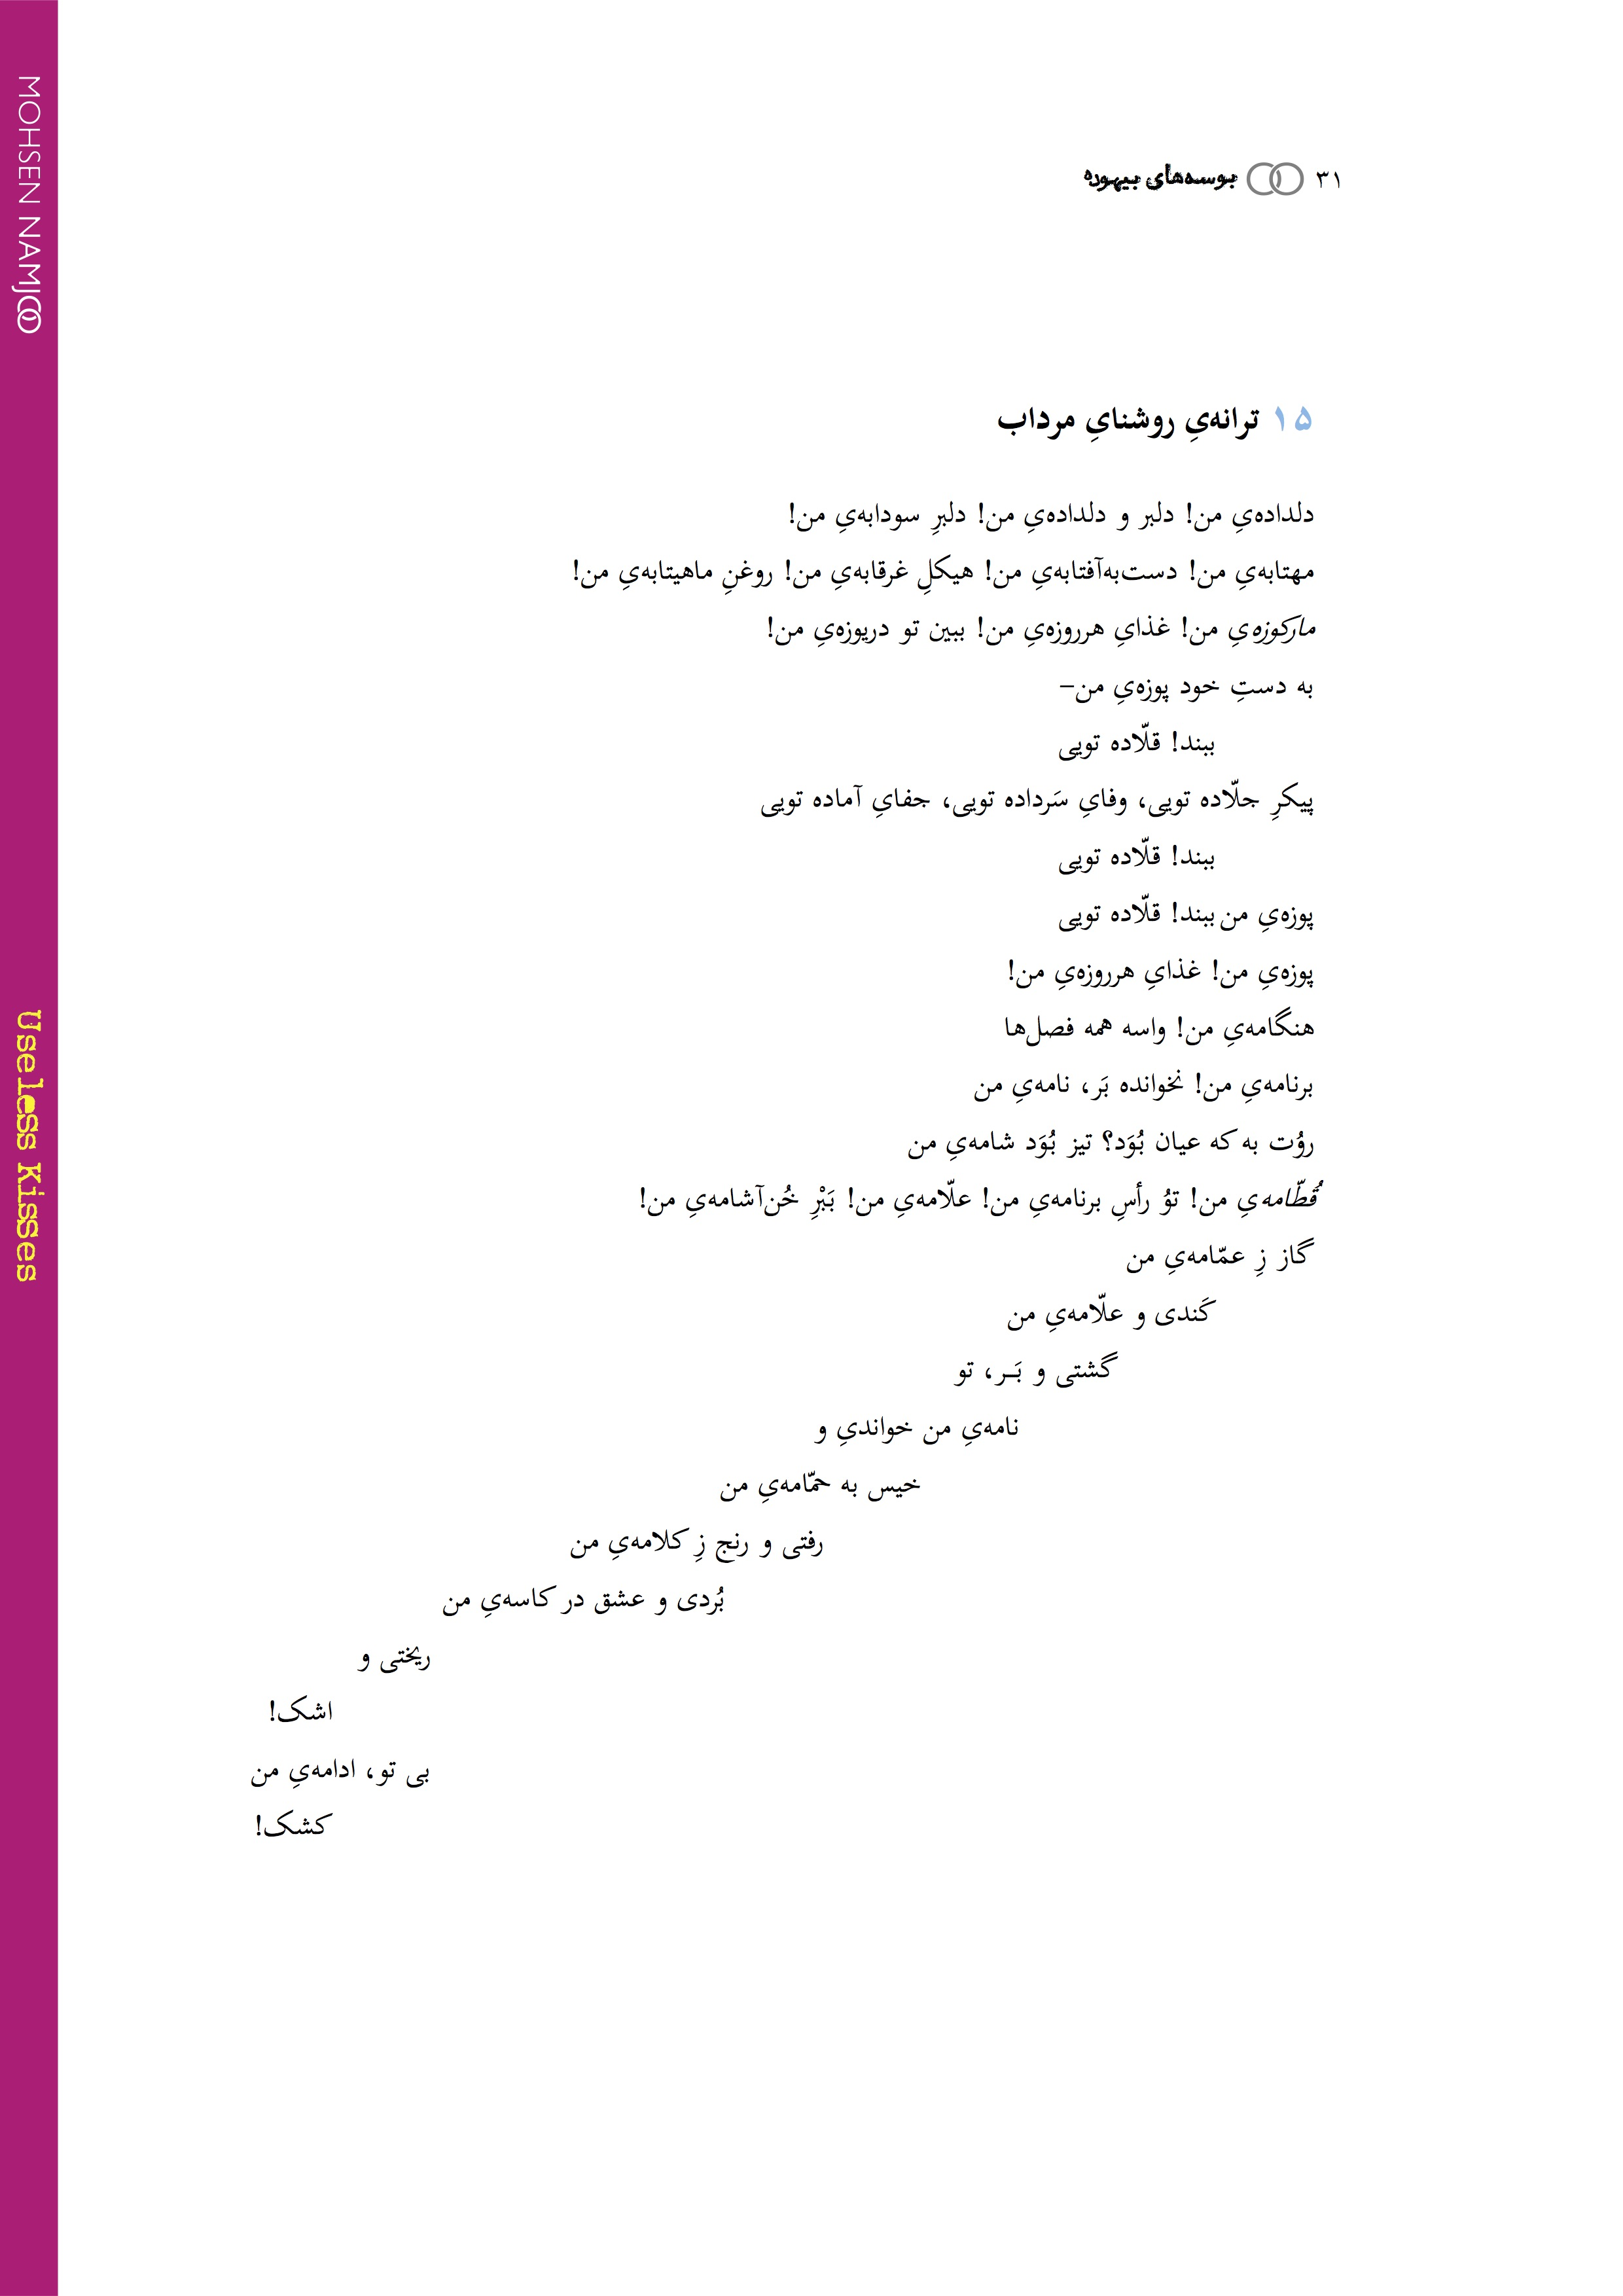 30Useless Kisses eBook (2nd Edition).jpg